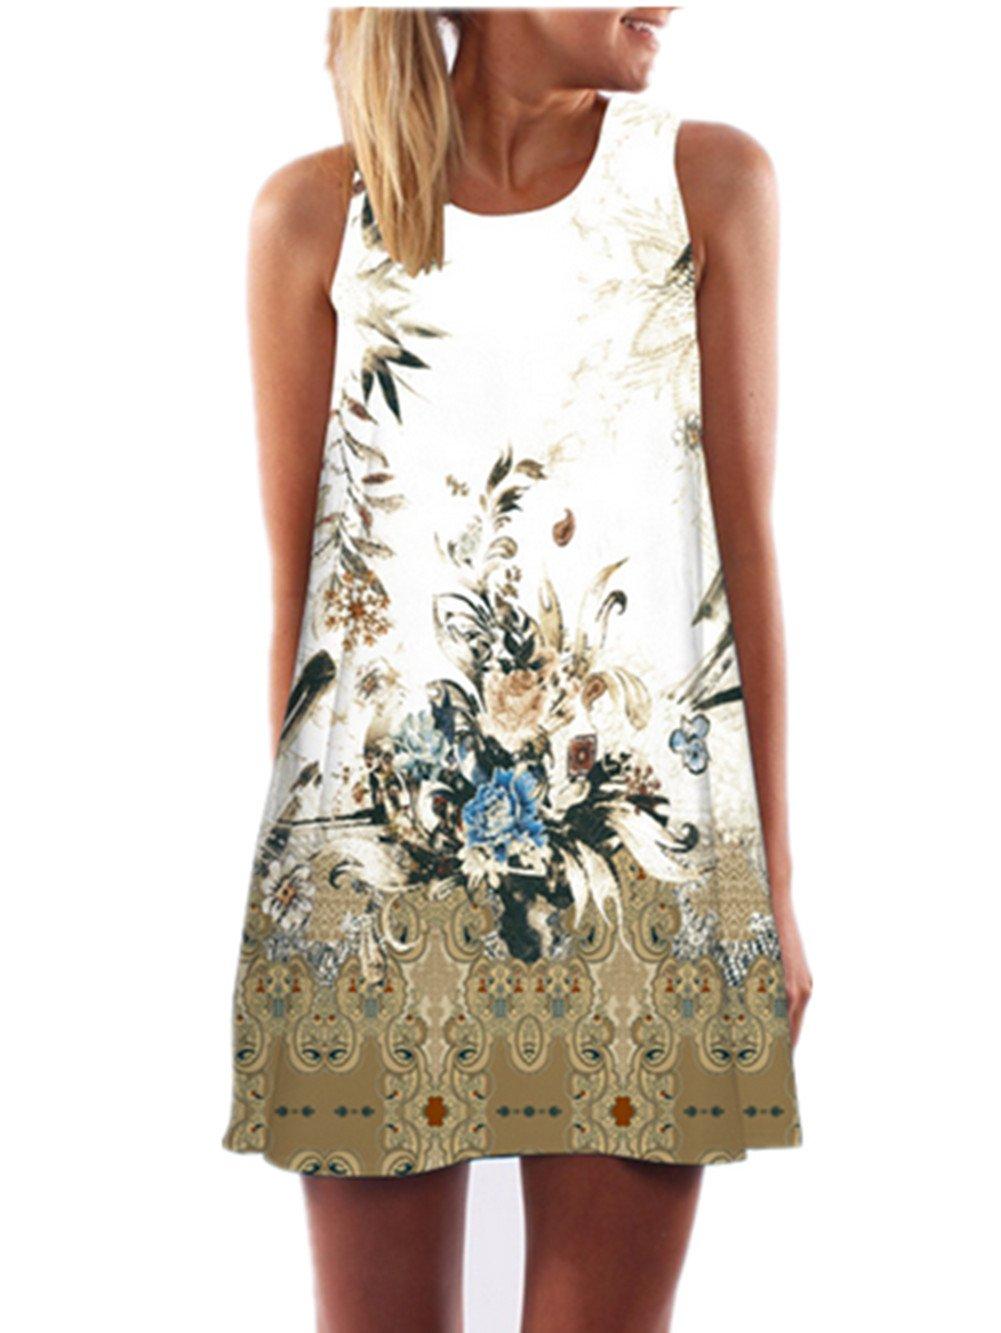 SRYSHKR 2018 Women's Summer Sleeveless Damask Floral Print Casual Loose T-Shirt Dress (M, White)